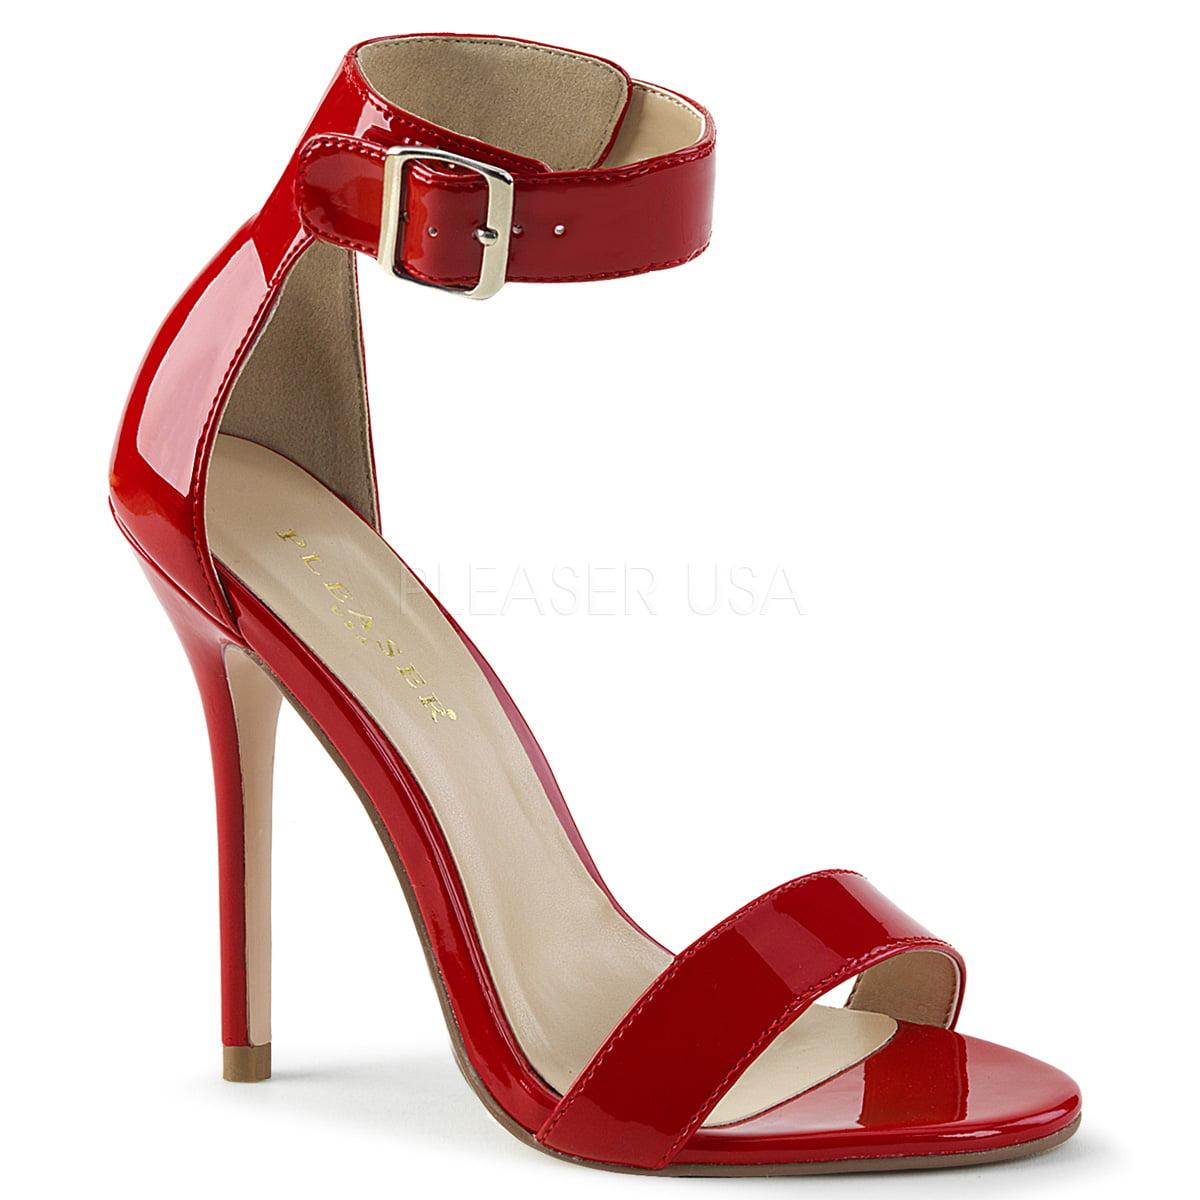 Women's Pleaser Amuse 10 Economical, stylish, and eye-catching shoes